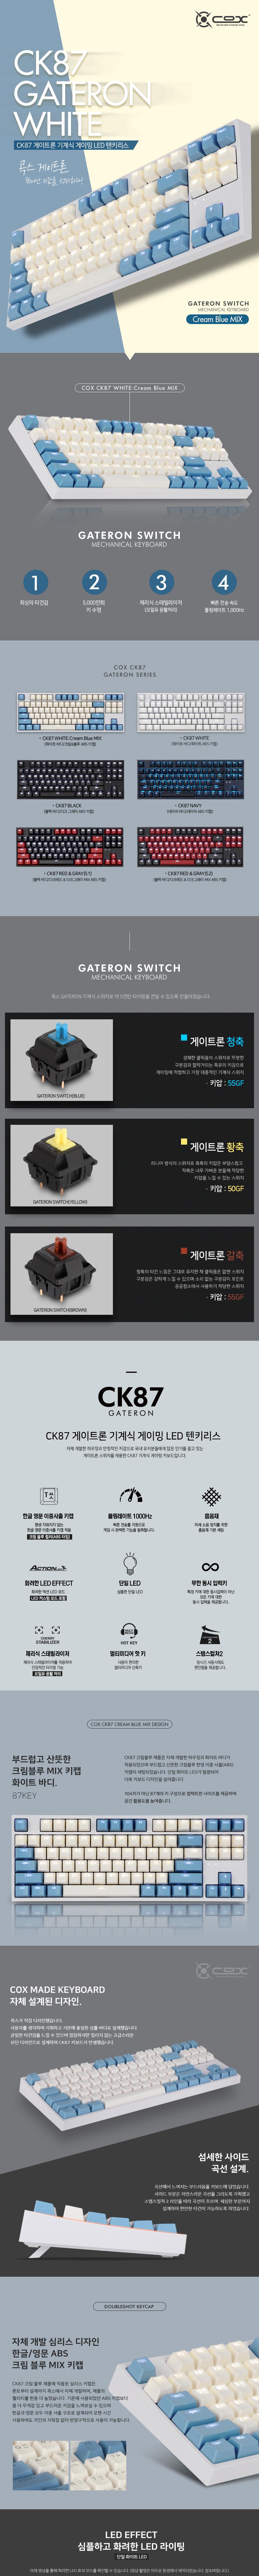 COX CK87 게이트론 LED 게이밍 기계식 (크림블루, 갈축)